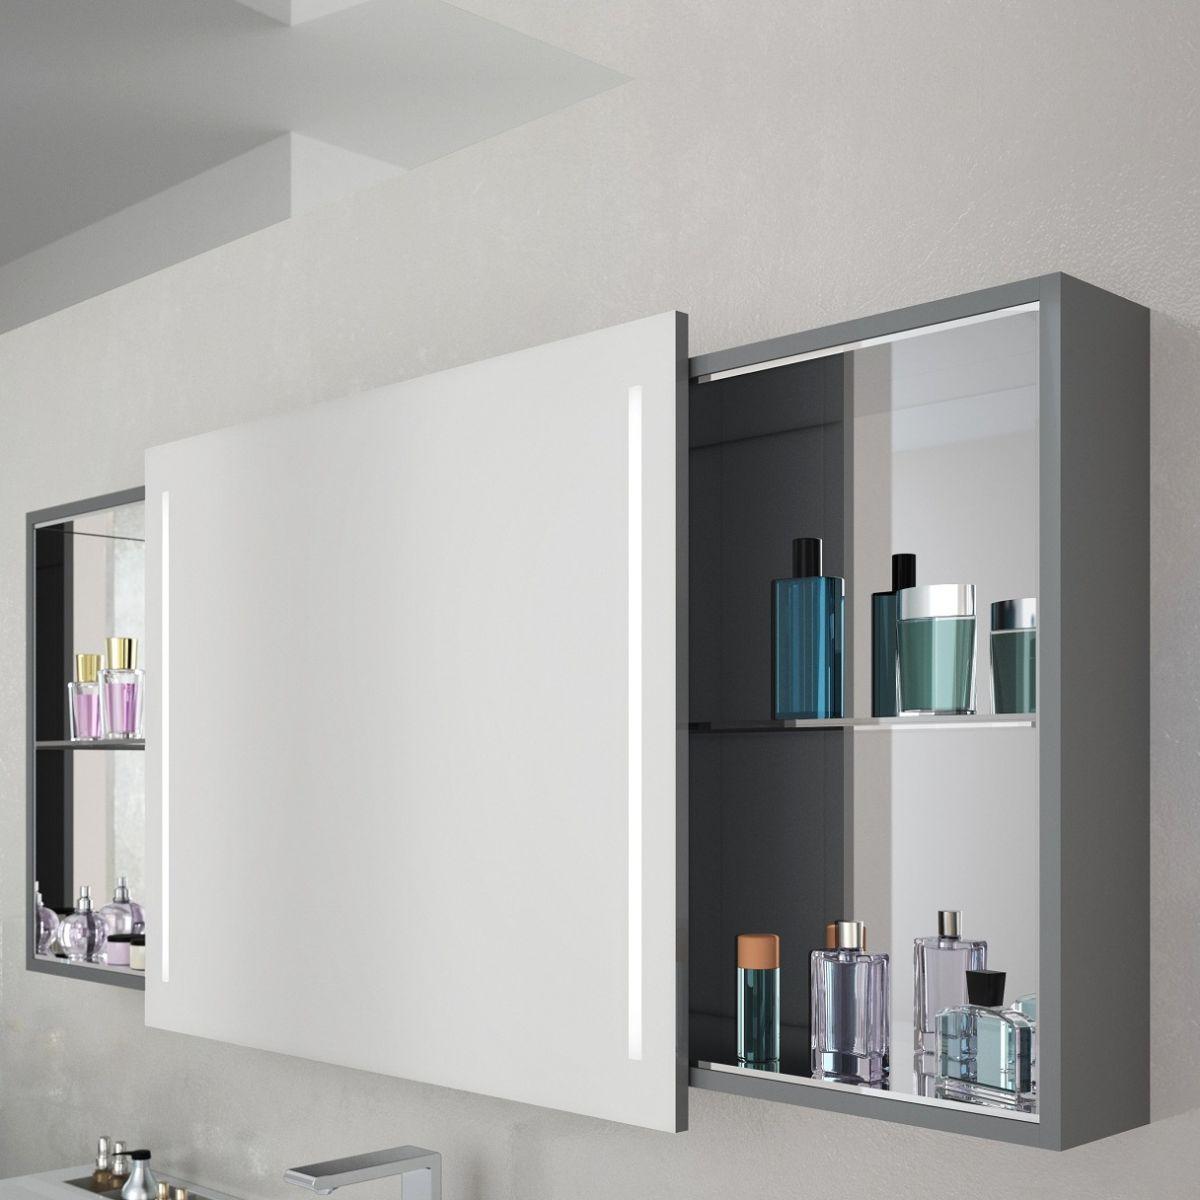 Surprising Vitra Memoria Illuminated Mirror Cabinet With Sliding Door Home Interior And Landscaping Oversignezvosmurscom